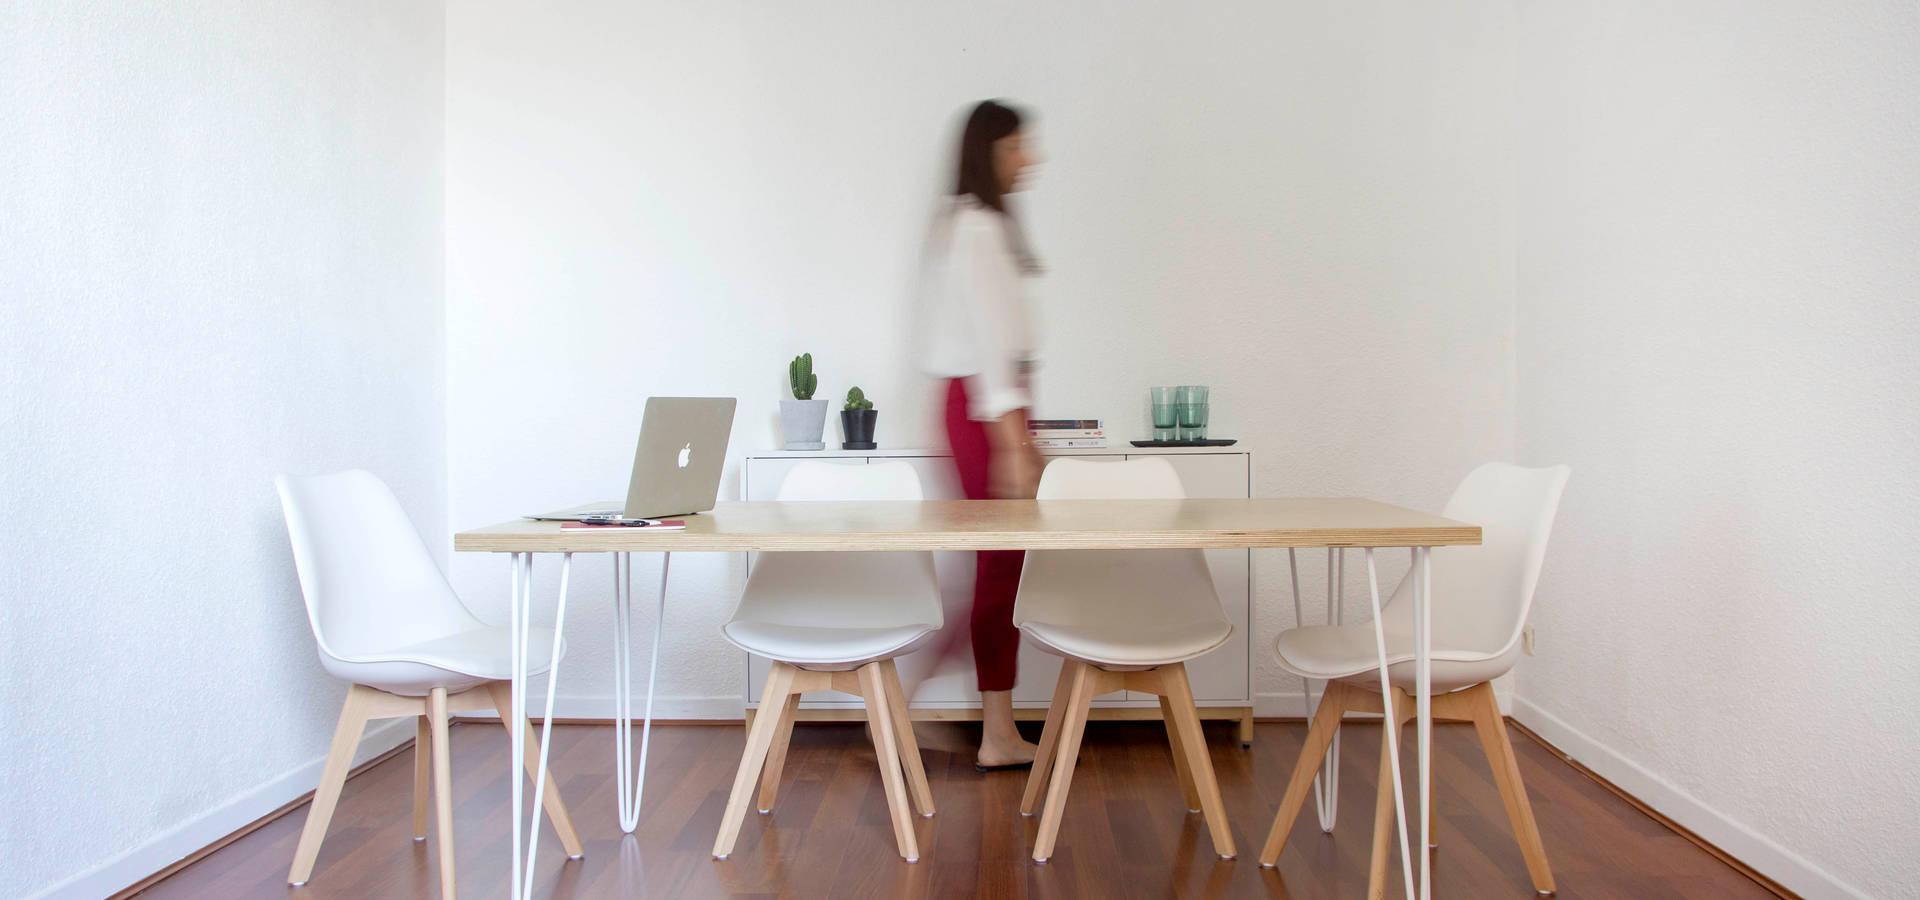 minibau innenarchitekten in berlin homify. Black Bedroom Furniture Sets. Home Design Ideas